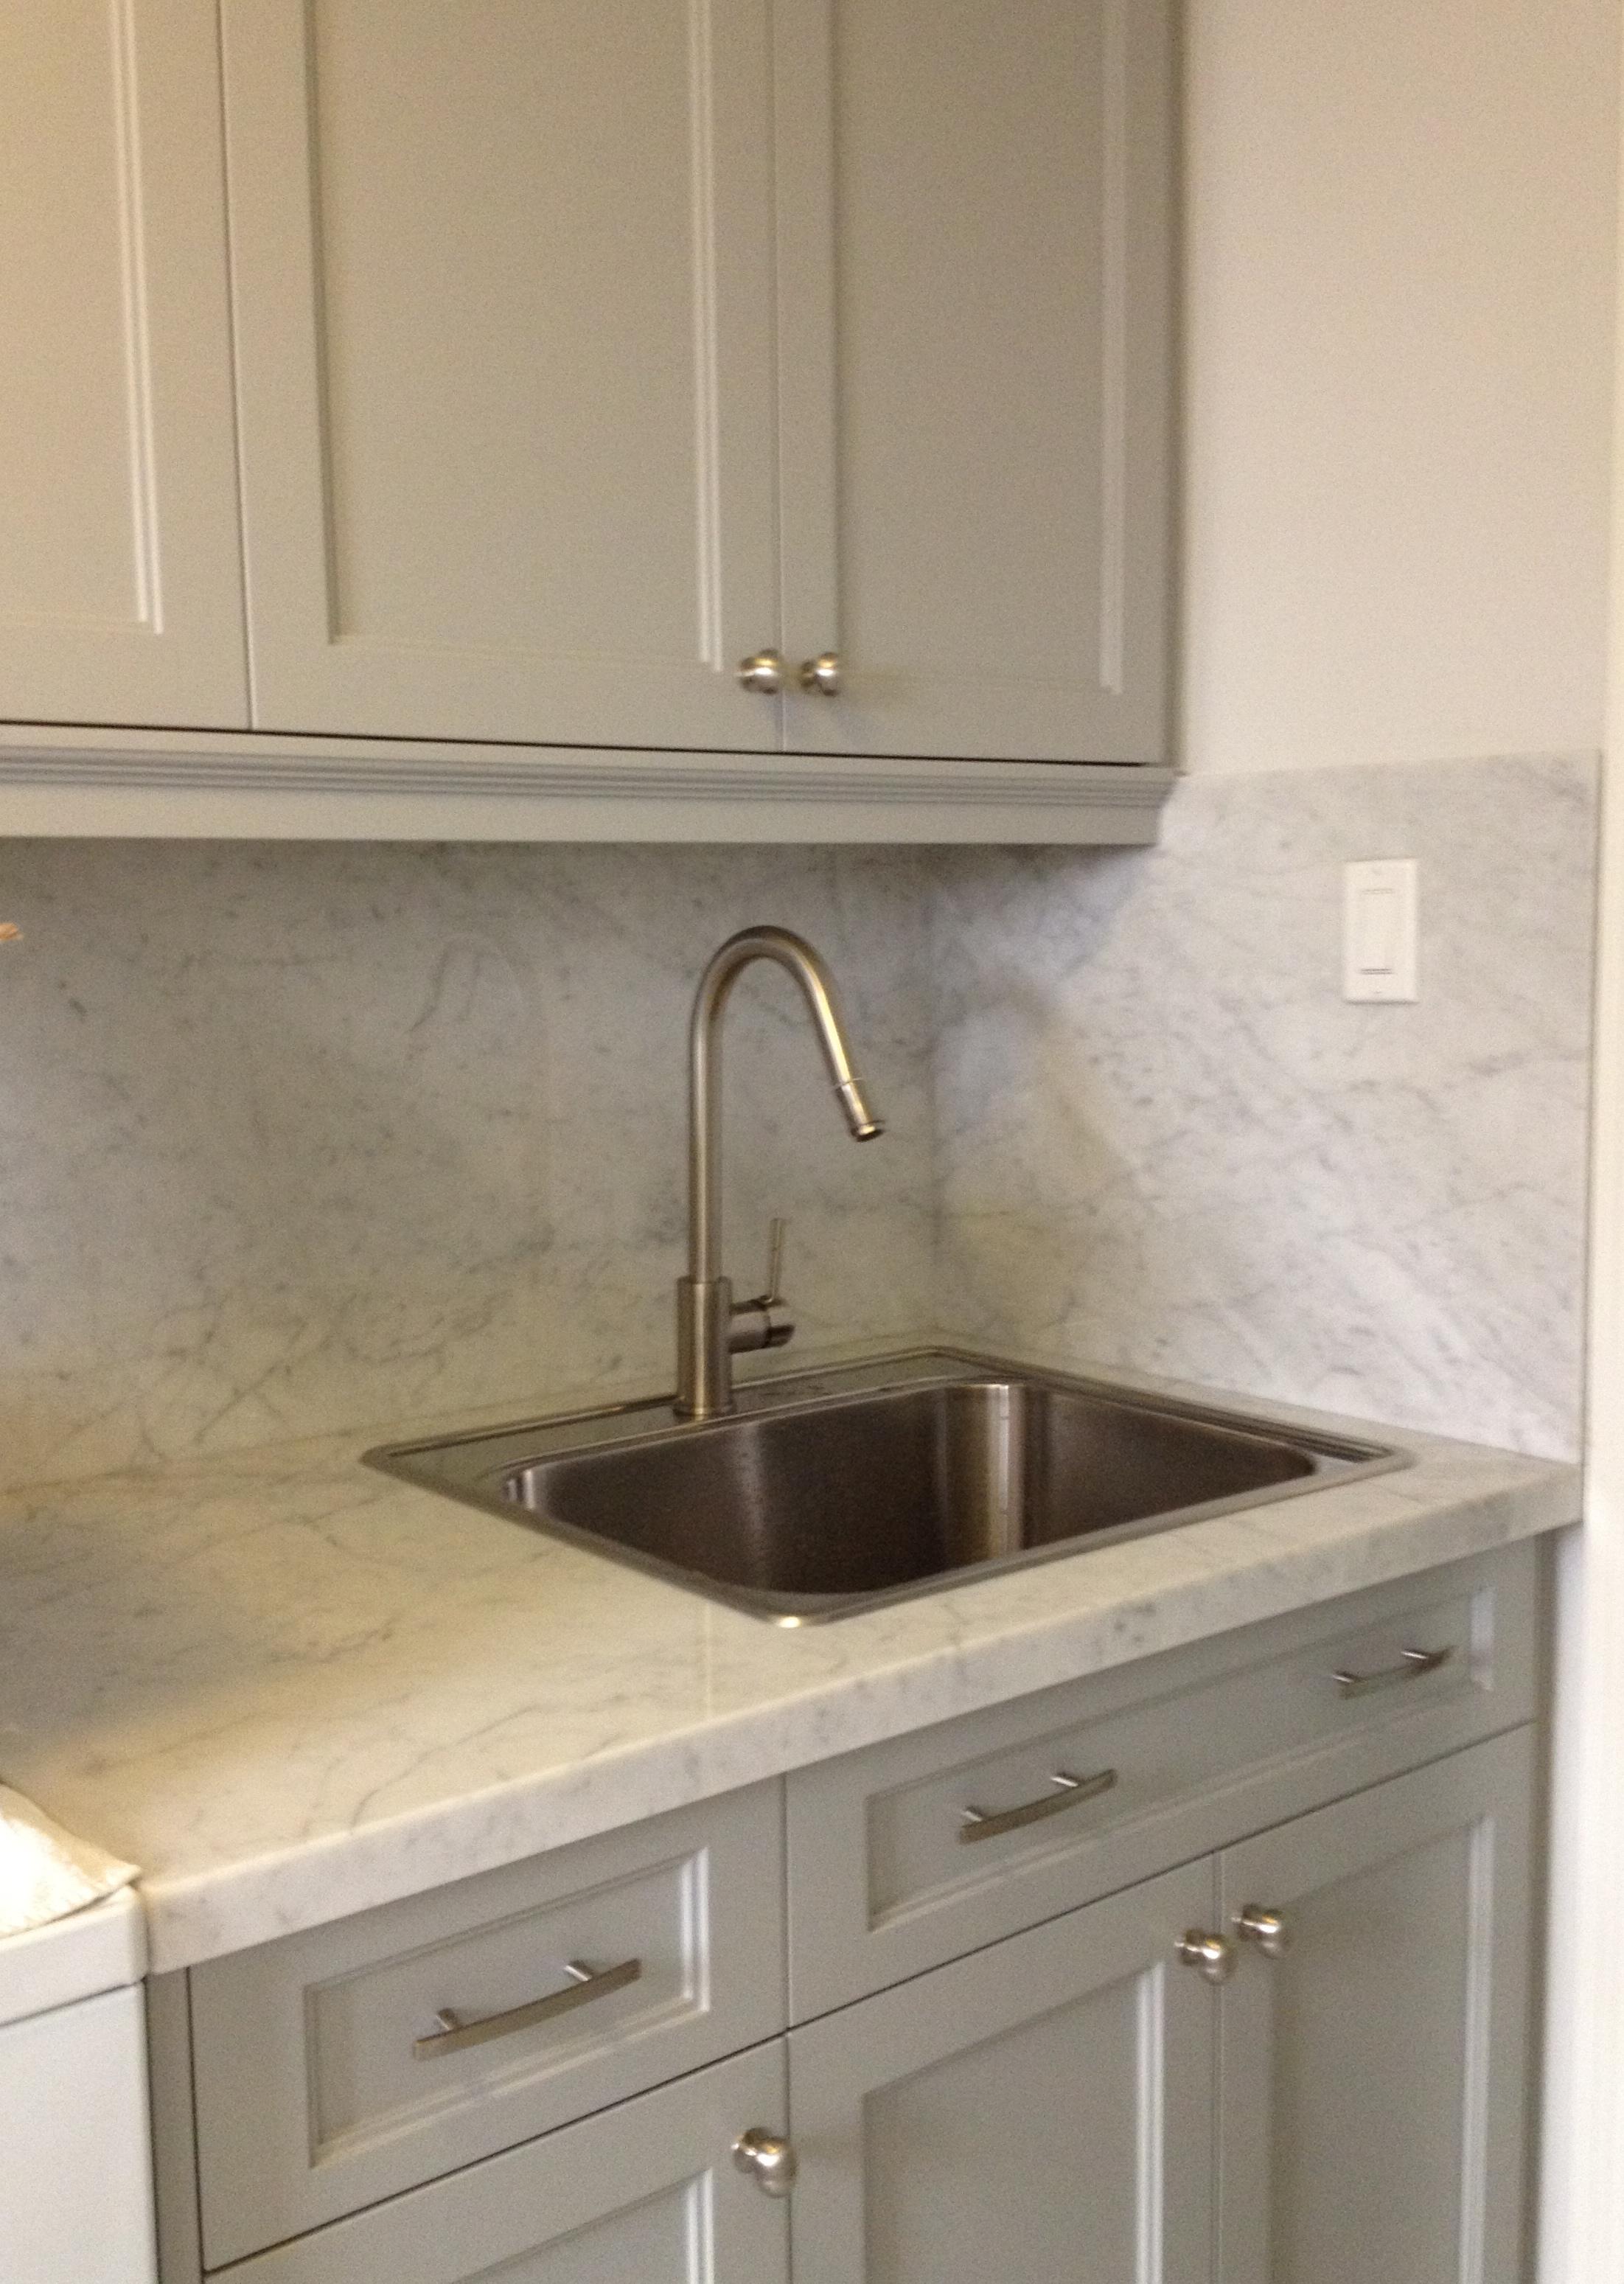 marketplace the trinsic by delta faucet delta trinsic kitchen faucet but